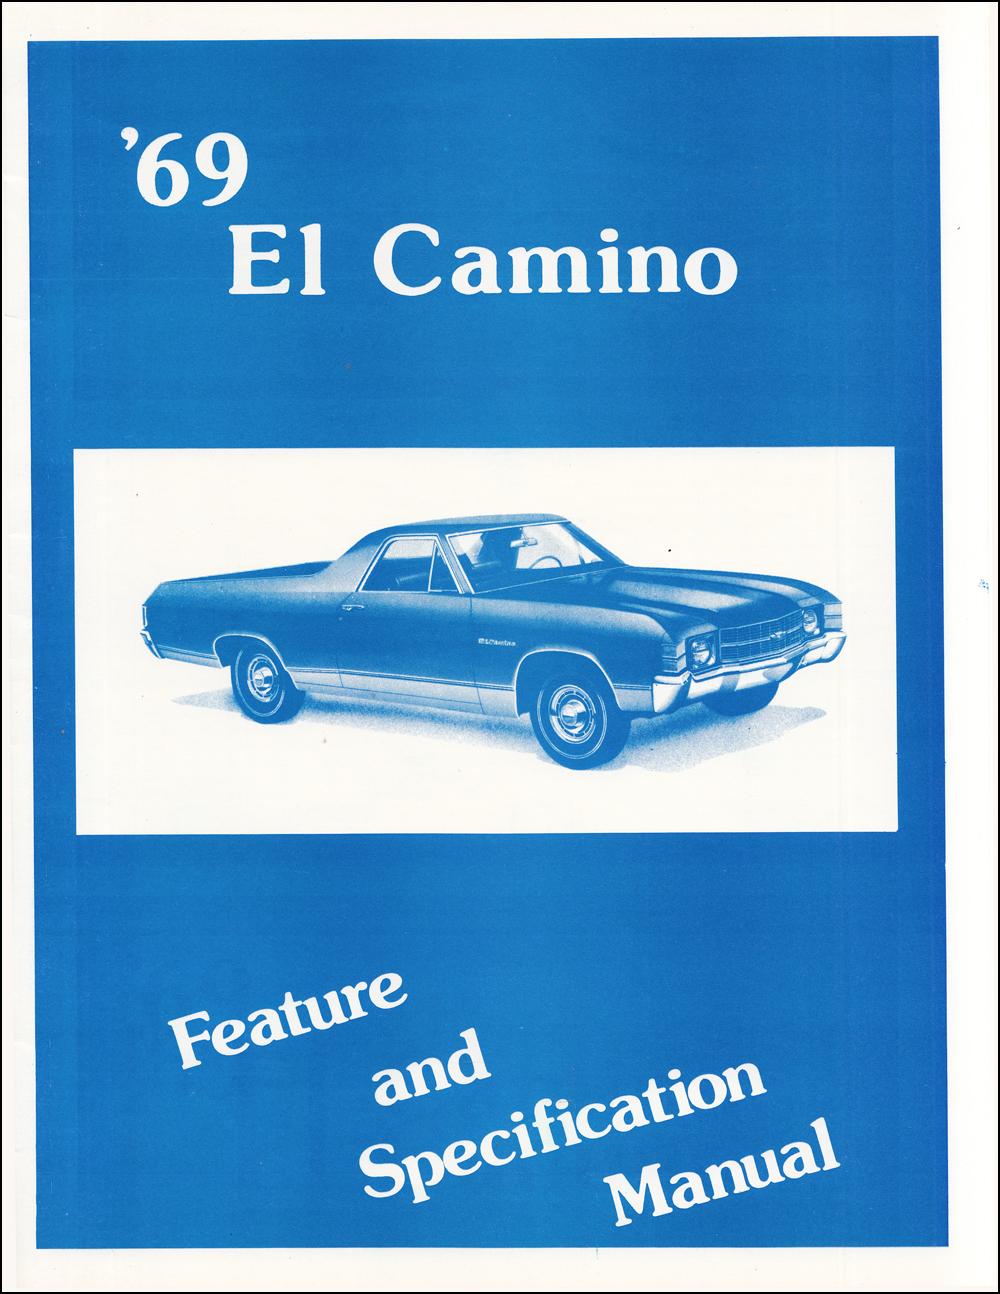 1969 Chevelle Assembly Manual Reprint El Camino Malibu Super Sport Ss